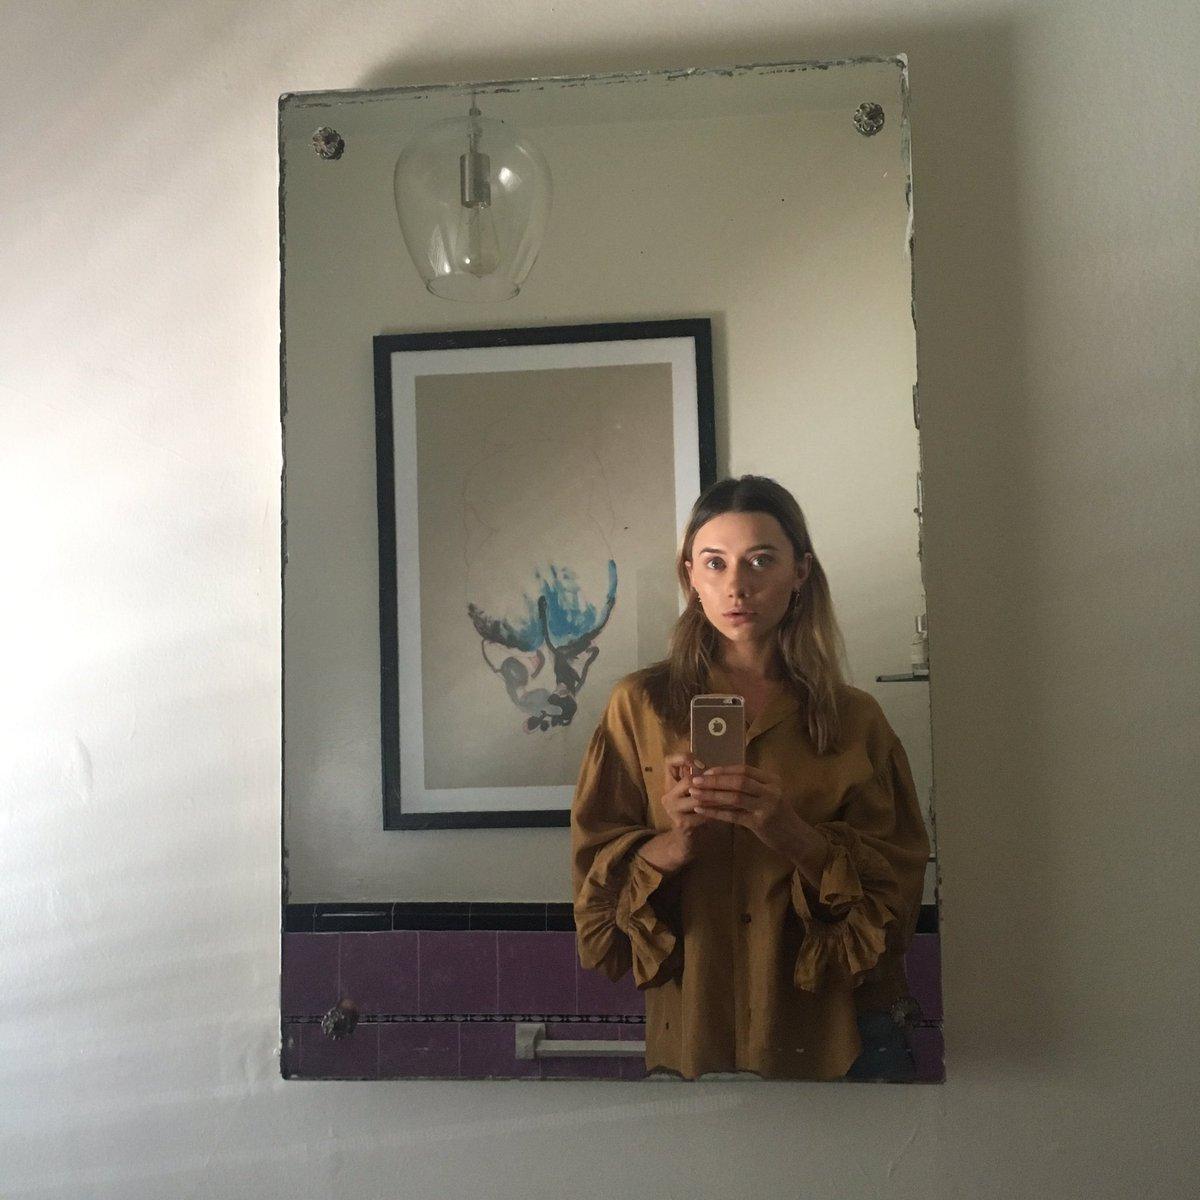 cameltoe Selfie Olesya Rulin naked photo 2017